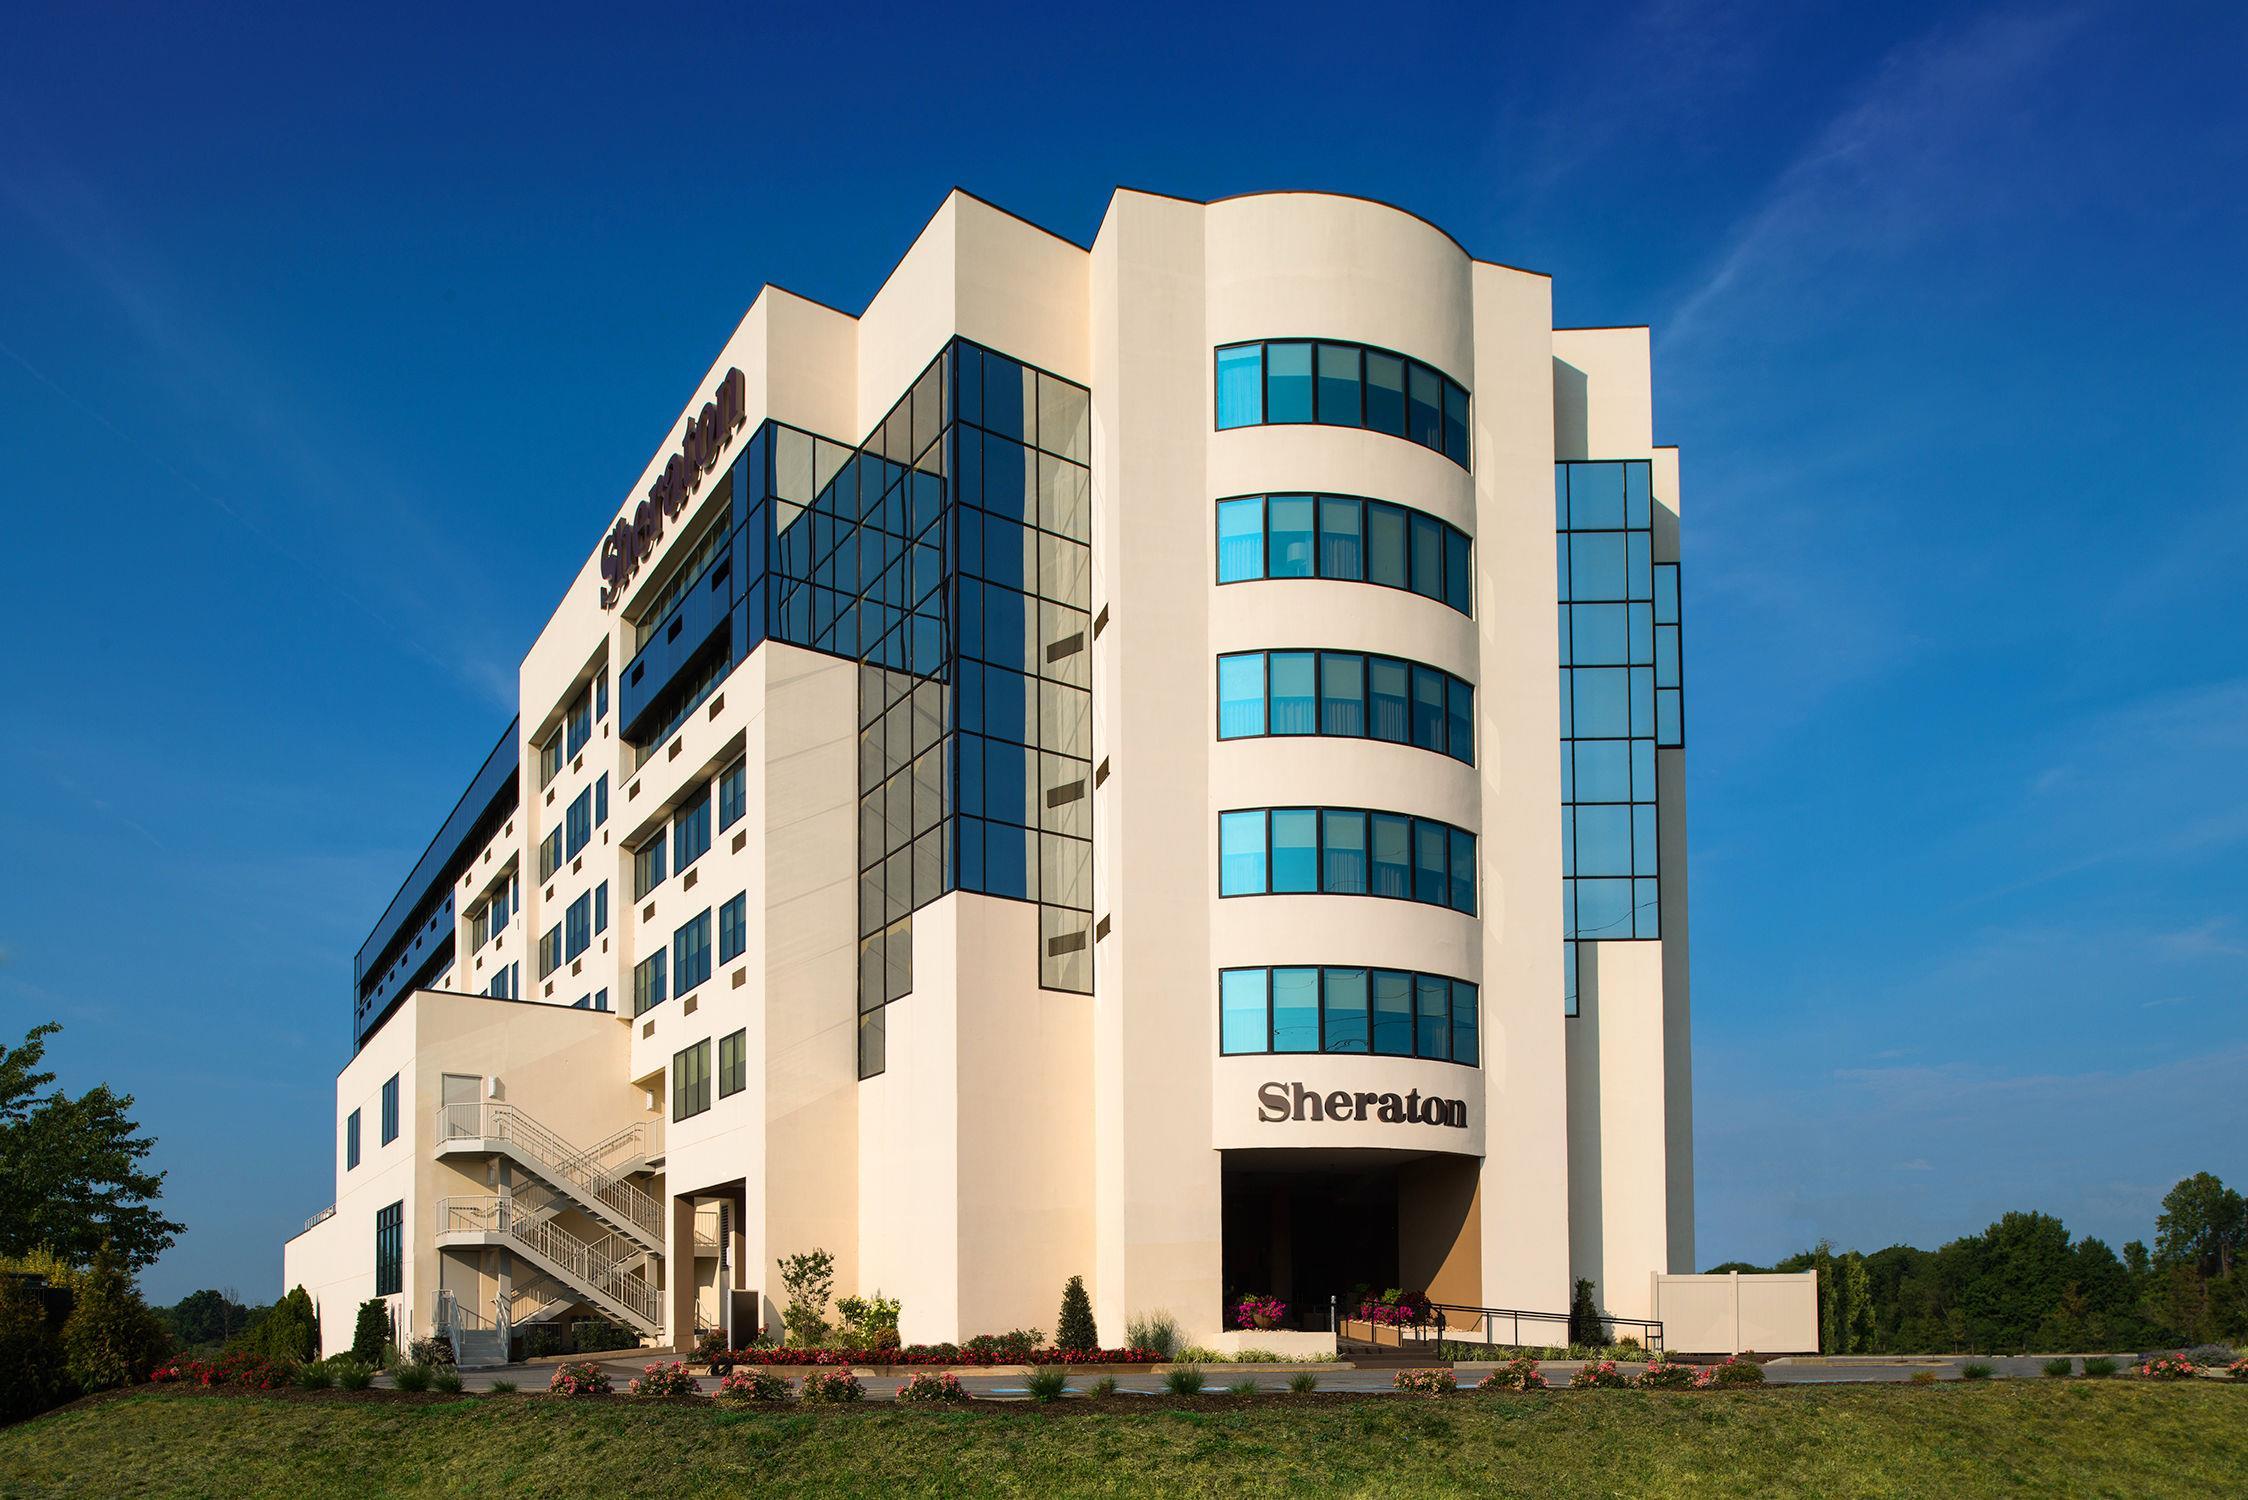 Sheraton Wilmington South Hotel image 0